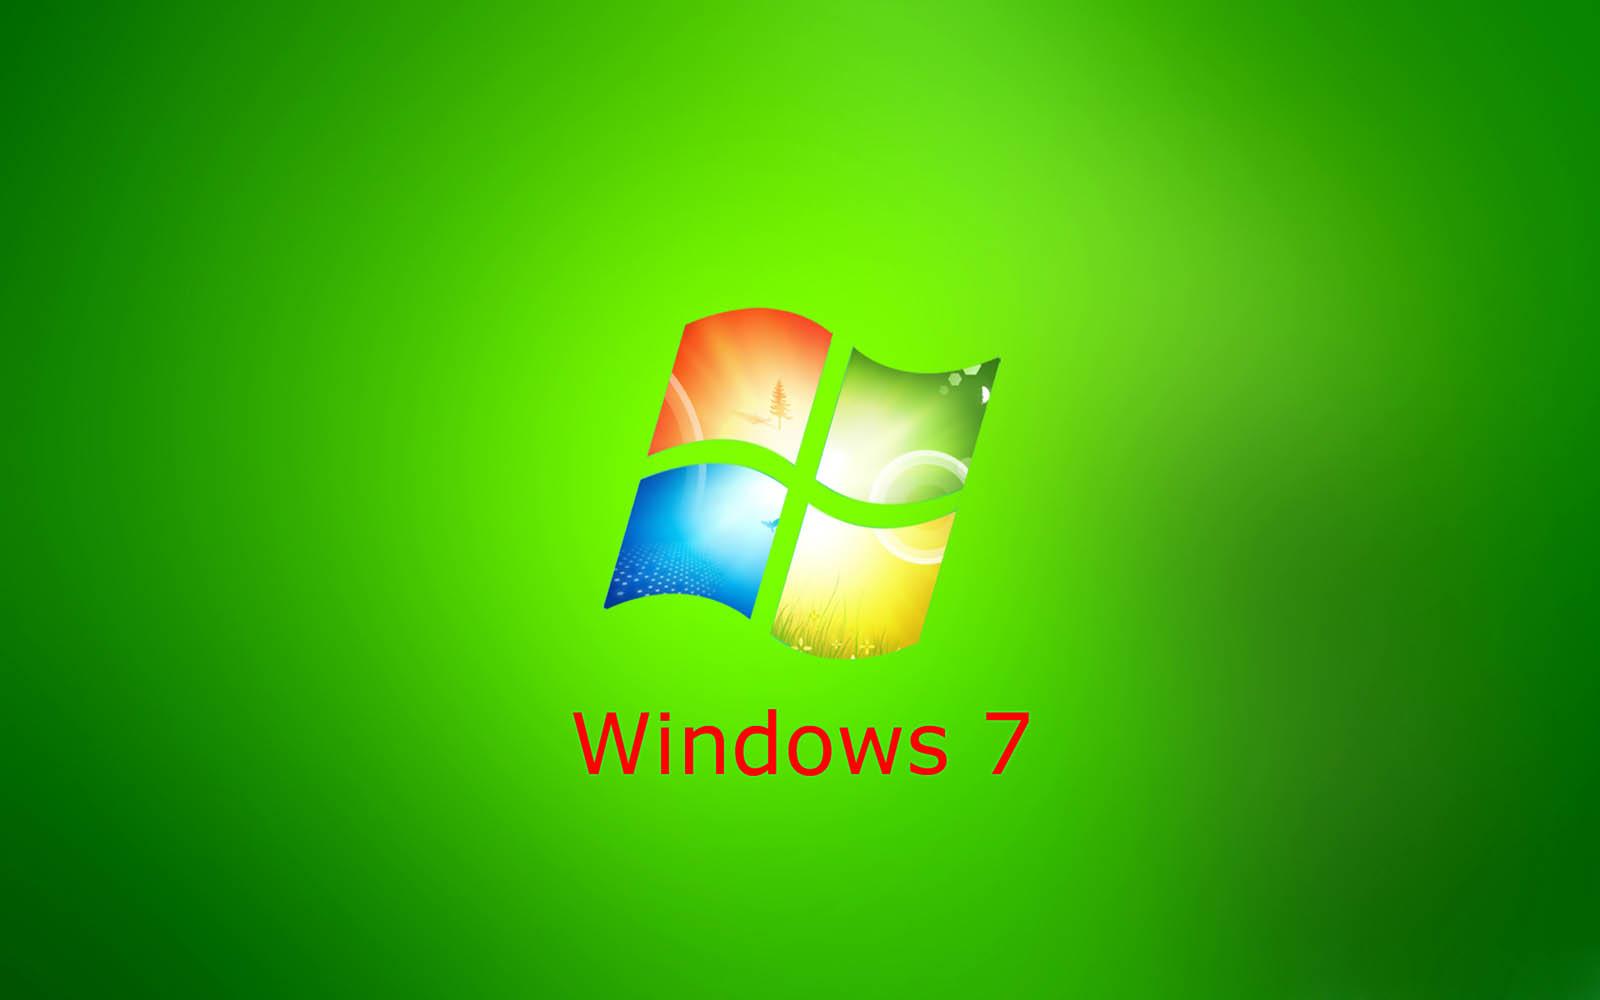 wallpapers: Green Windows 7 Wallpapers